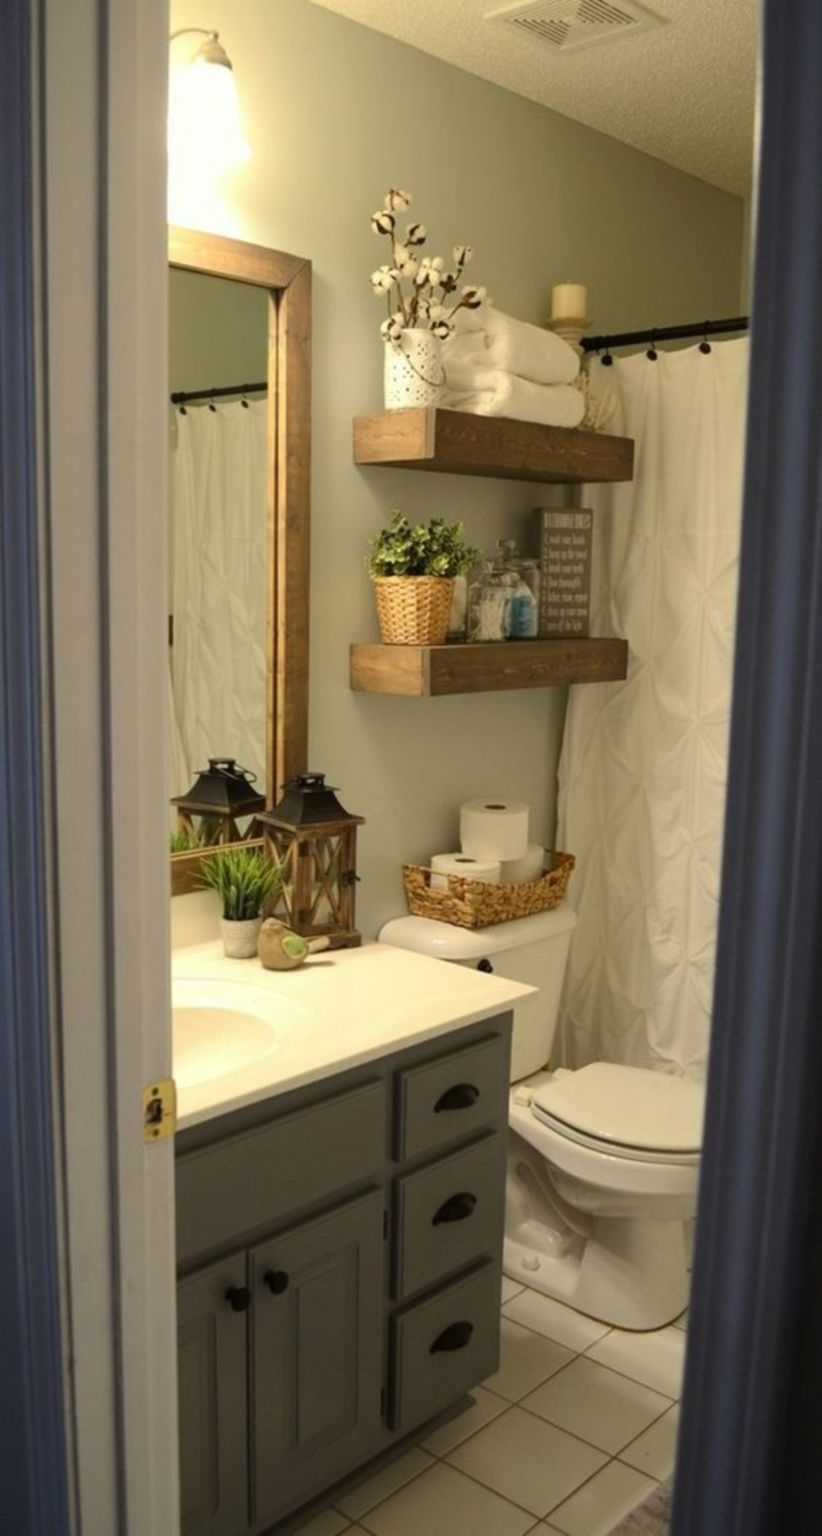 Modern farmhouse bathroom remodel ideas with small space